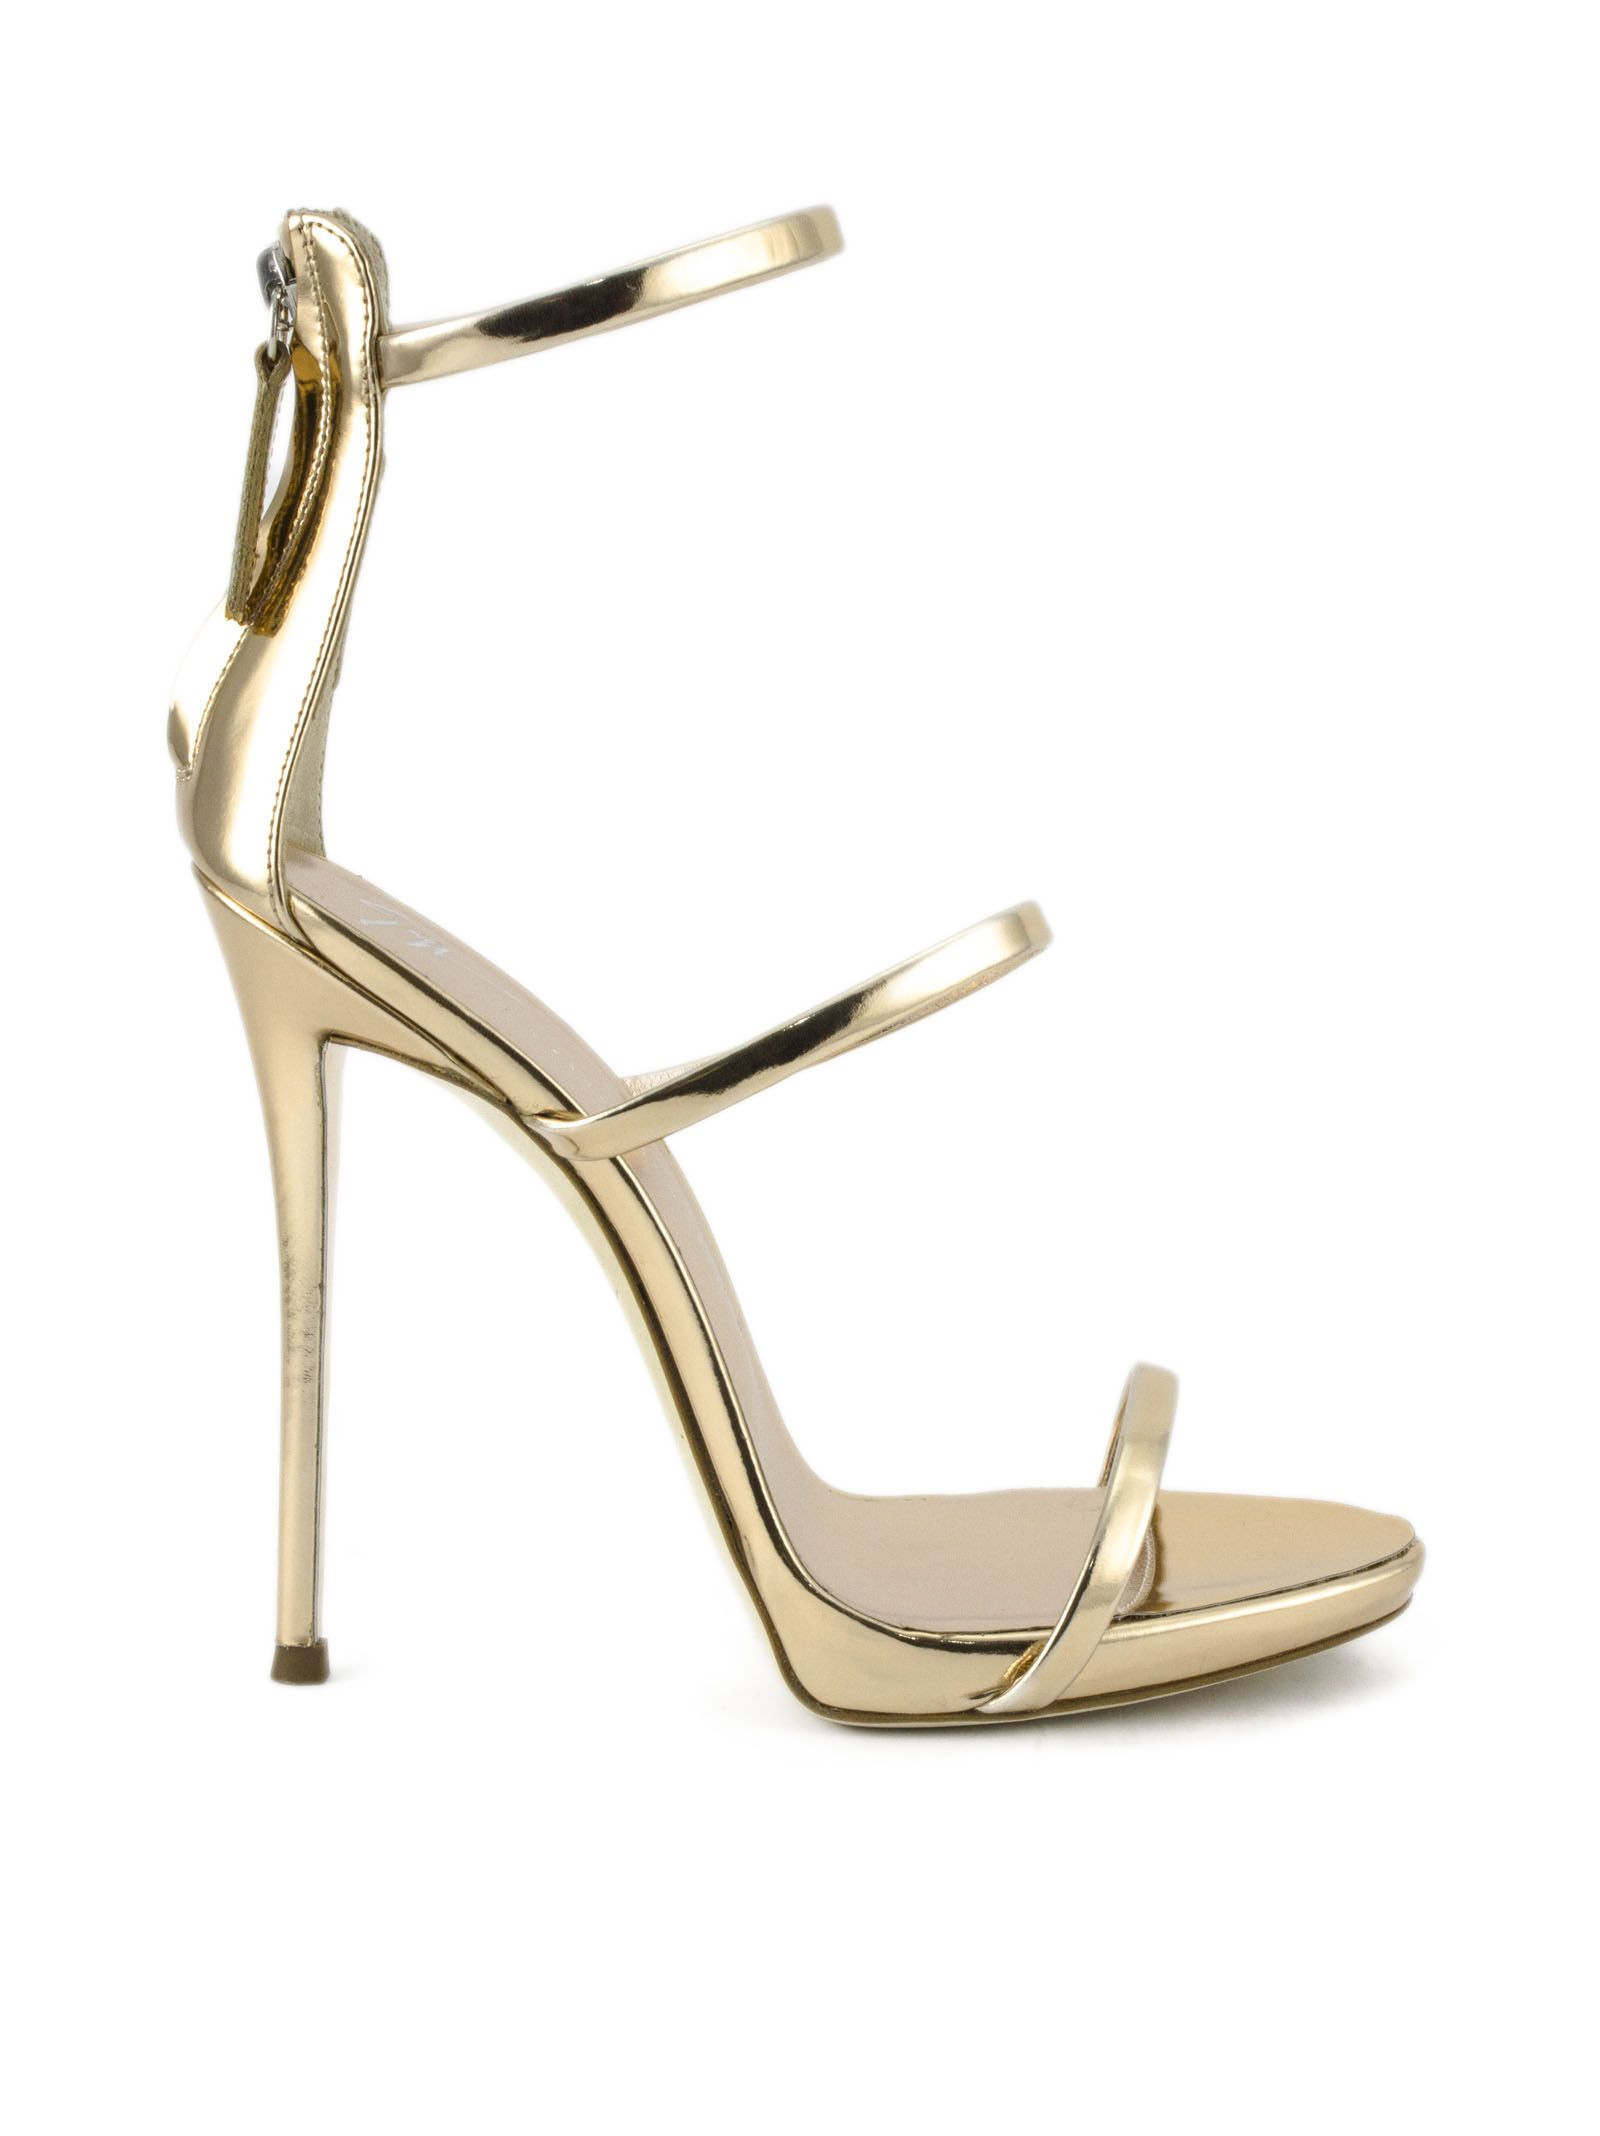 02e354f61de Giuseppe Zanotti Giuseppe Zanotti Metallic Rose Gold Leather Sandal ...